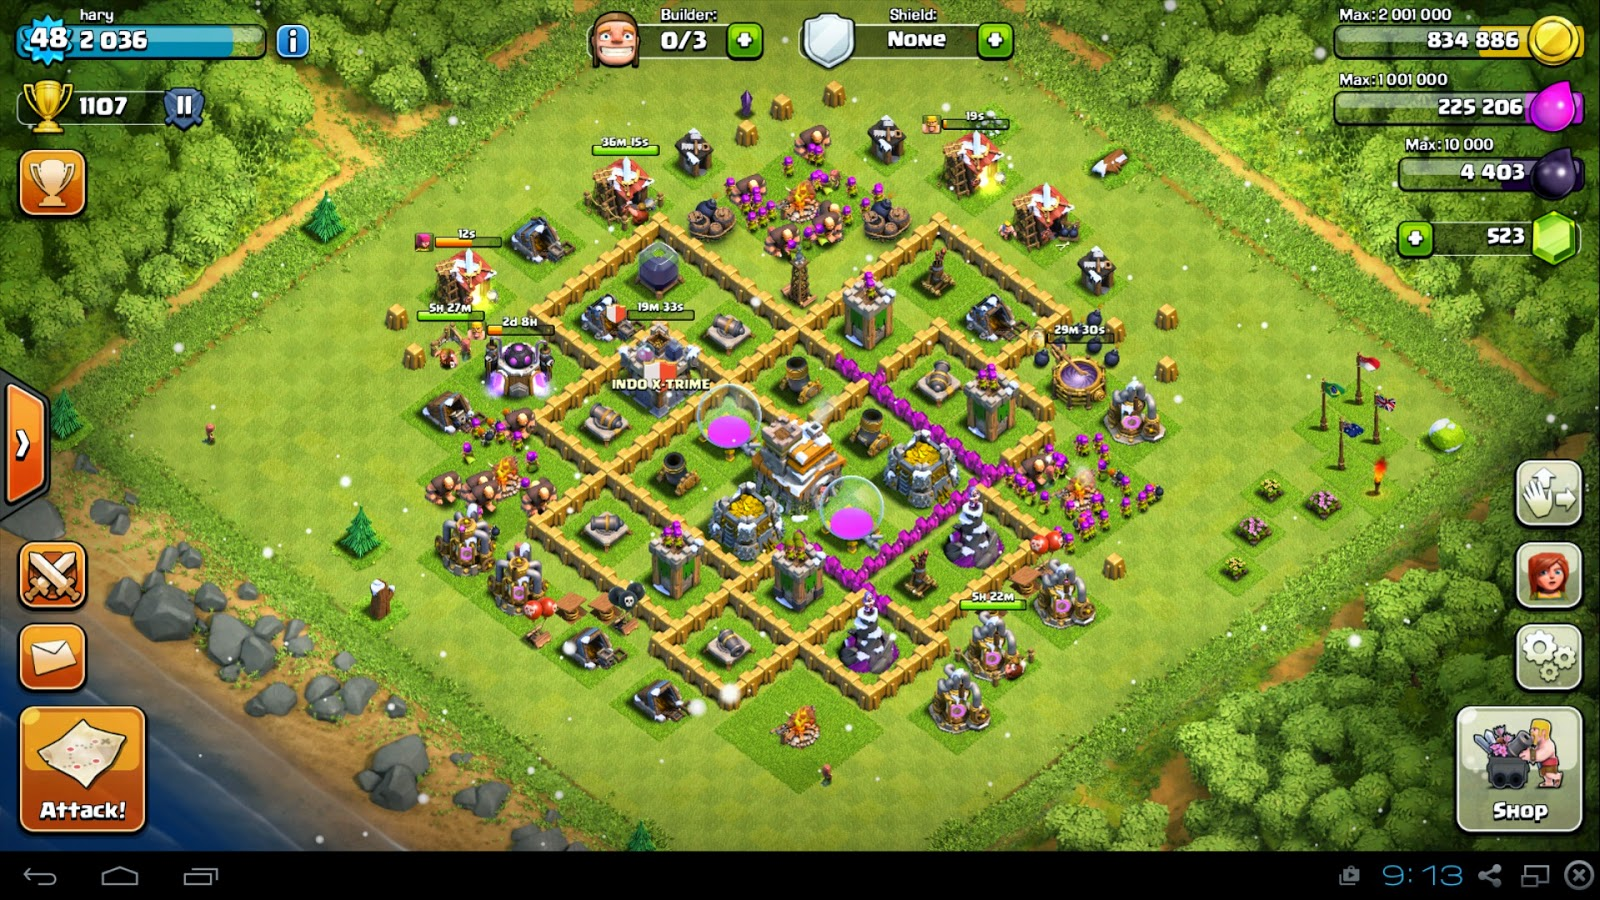 Best No Town Tesla Base Clans Clash Hall 7 Hidden